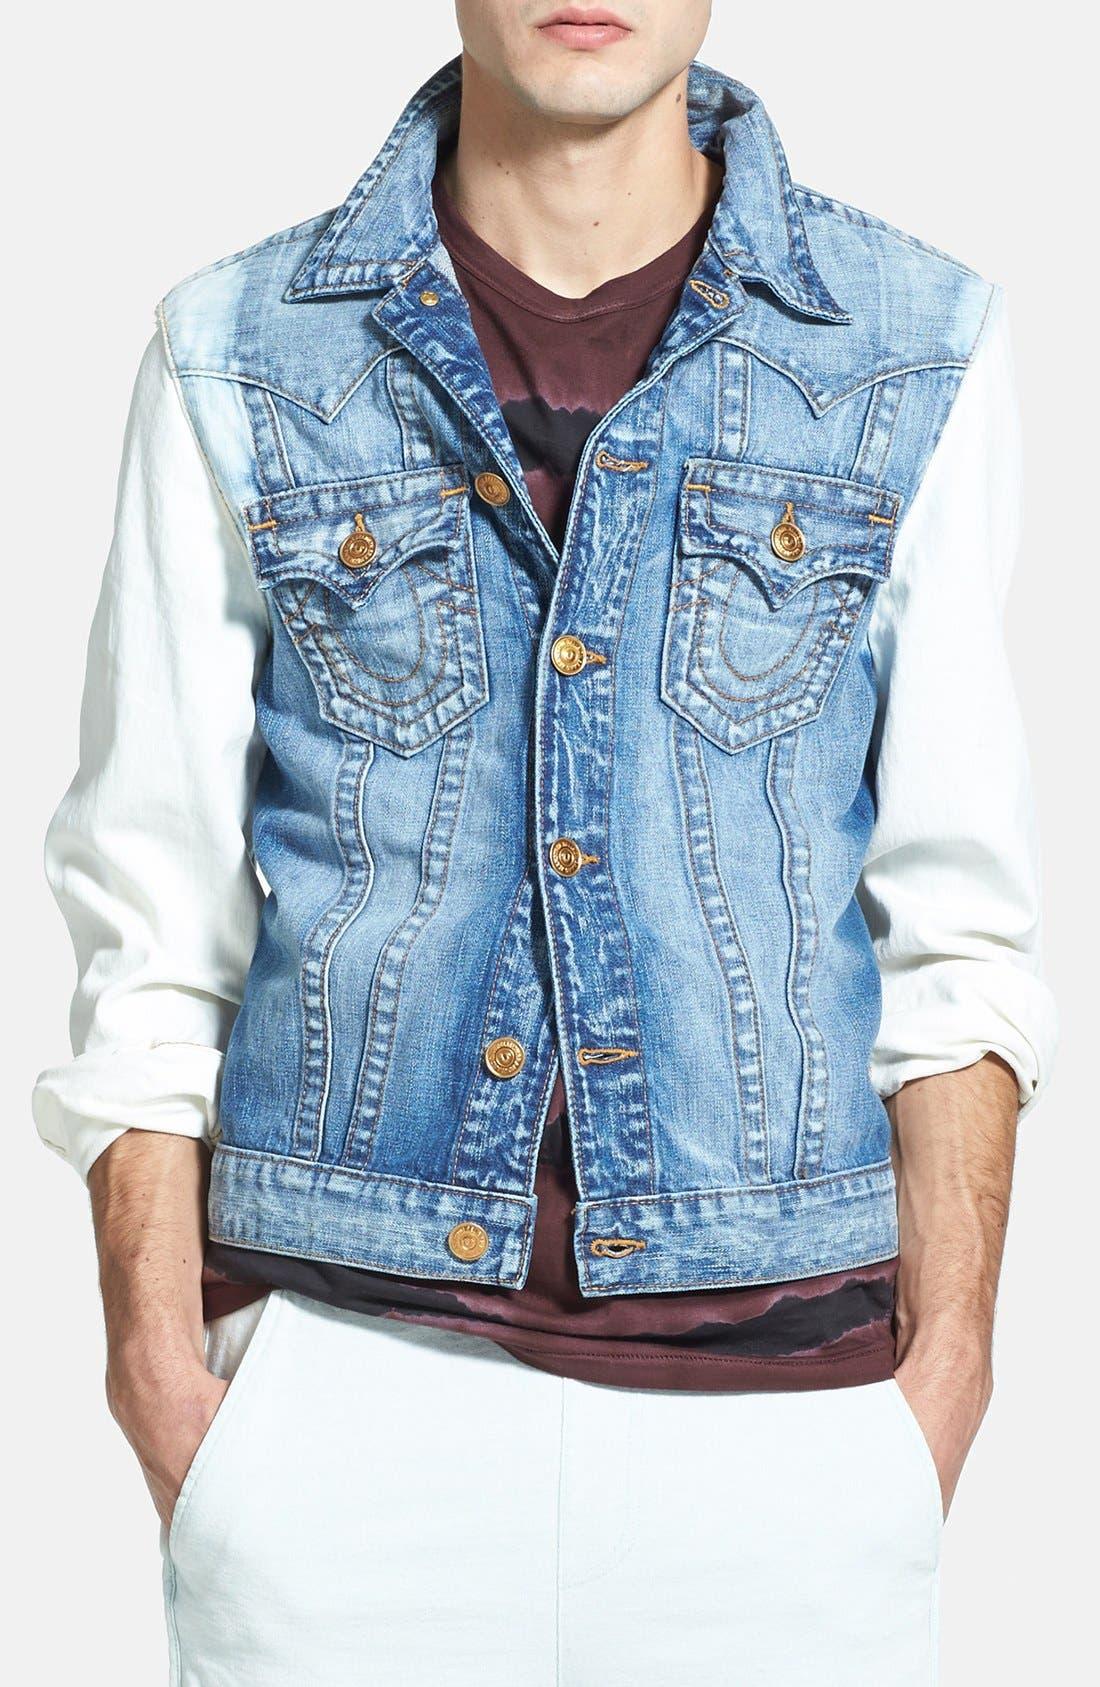 Alternate Image 1 Selected - True Religion Brand Jeans 'Jimmy' Trim Fit Washed Denim Jacket